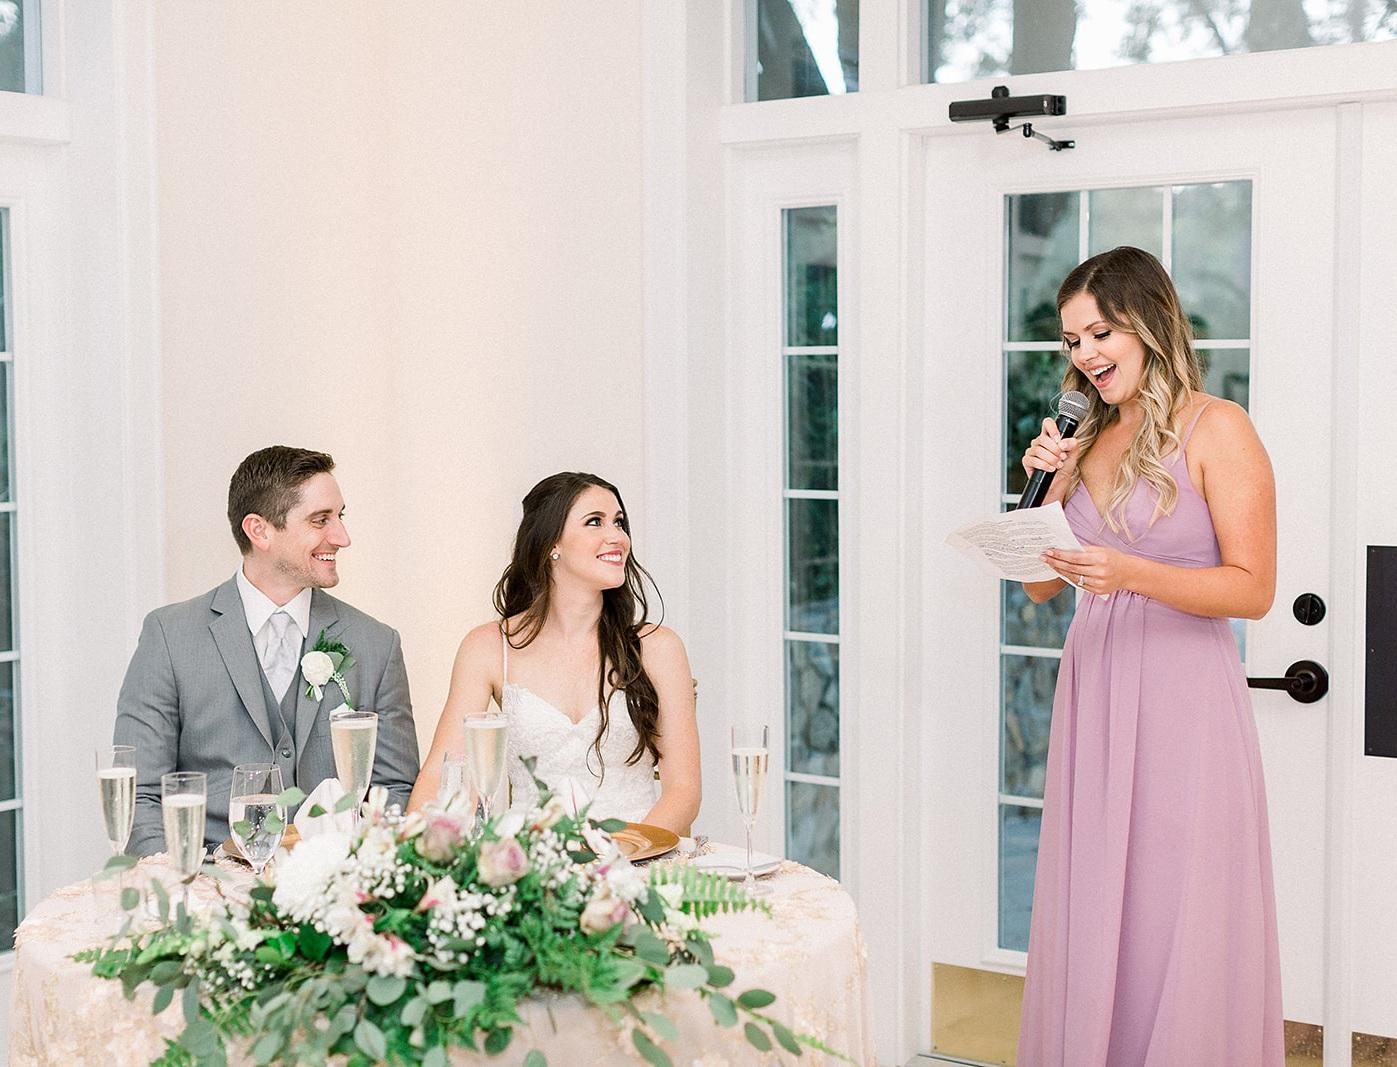 Shannon + Garrett Dyer Lange Farm Wedding Photographer Casie Marie Photography-793.jpg